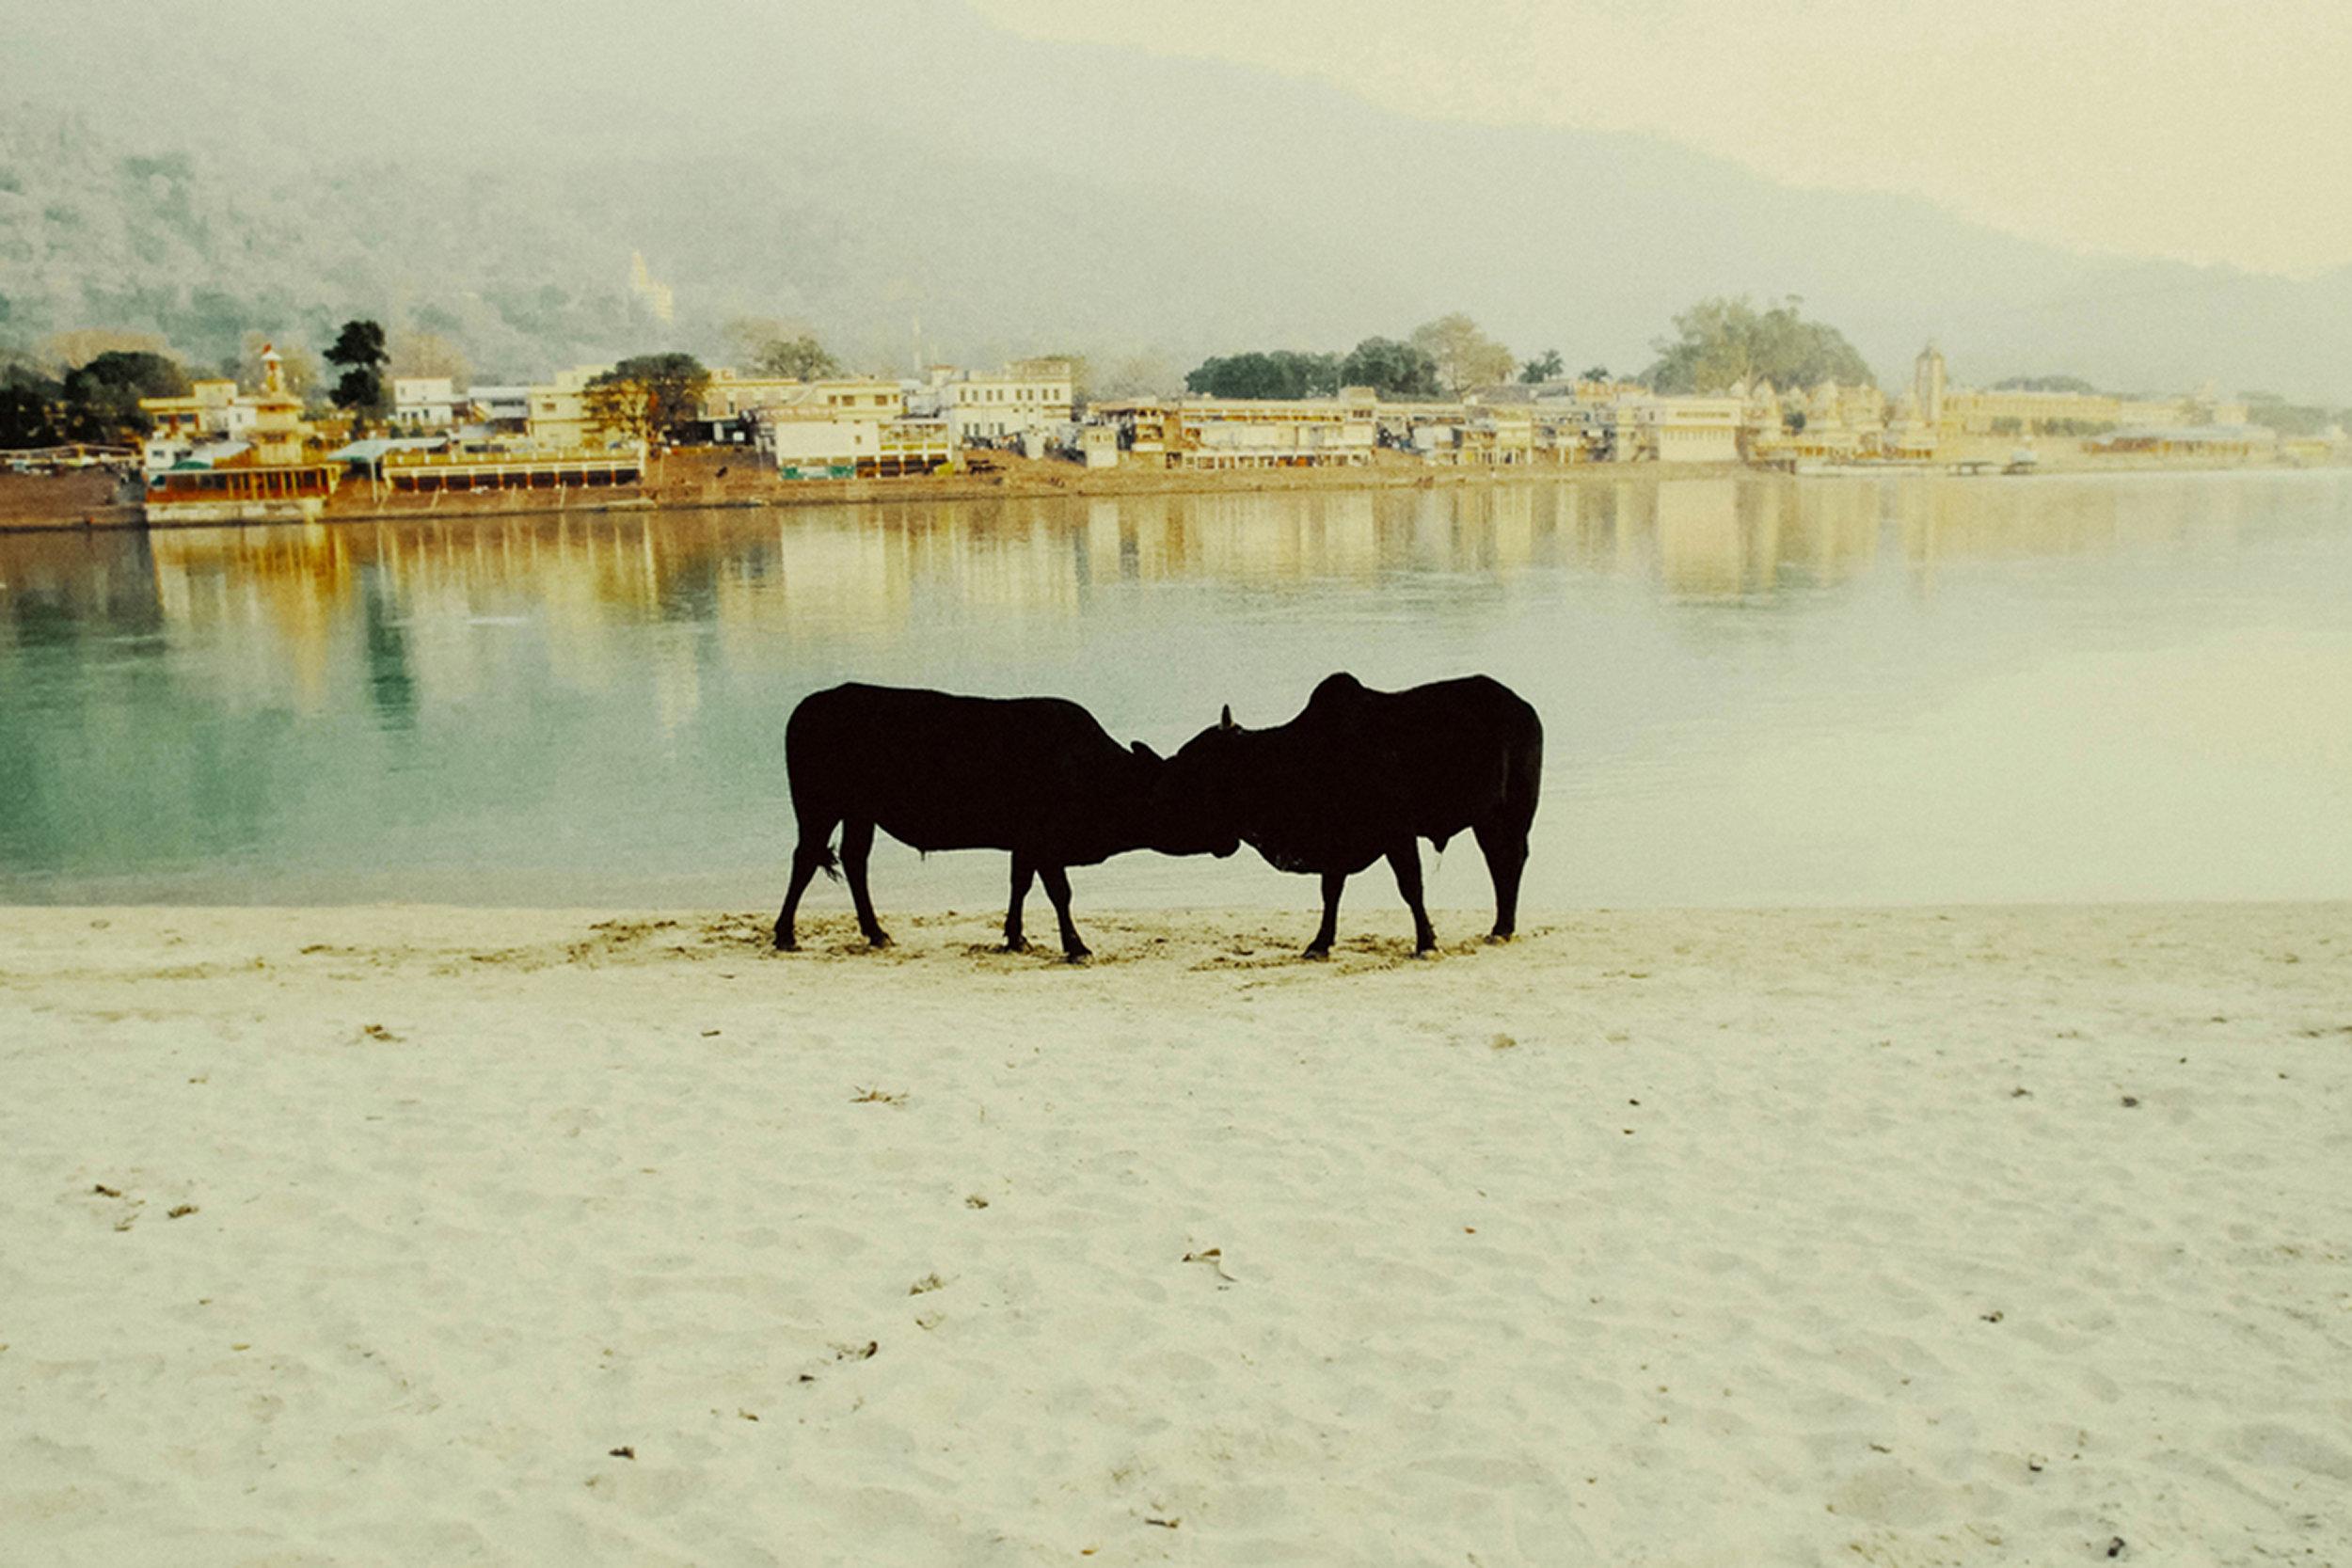 ©Debmalya Choudhuri